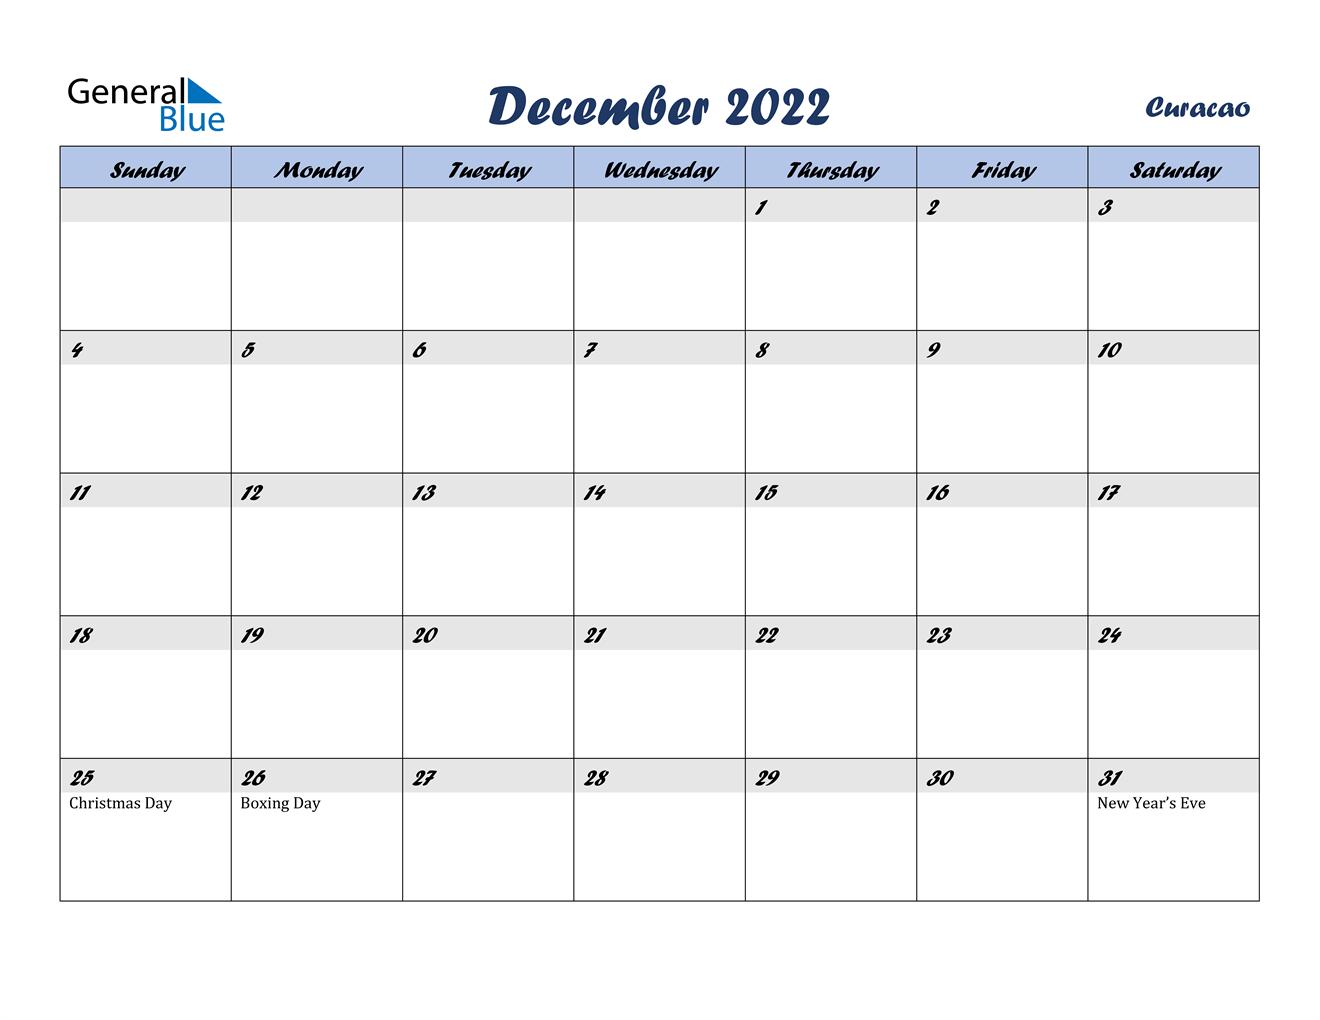 December 2022 Calendar - Curacao